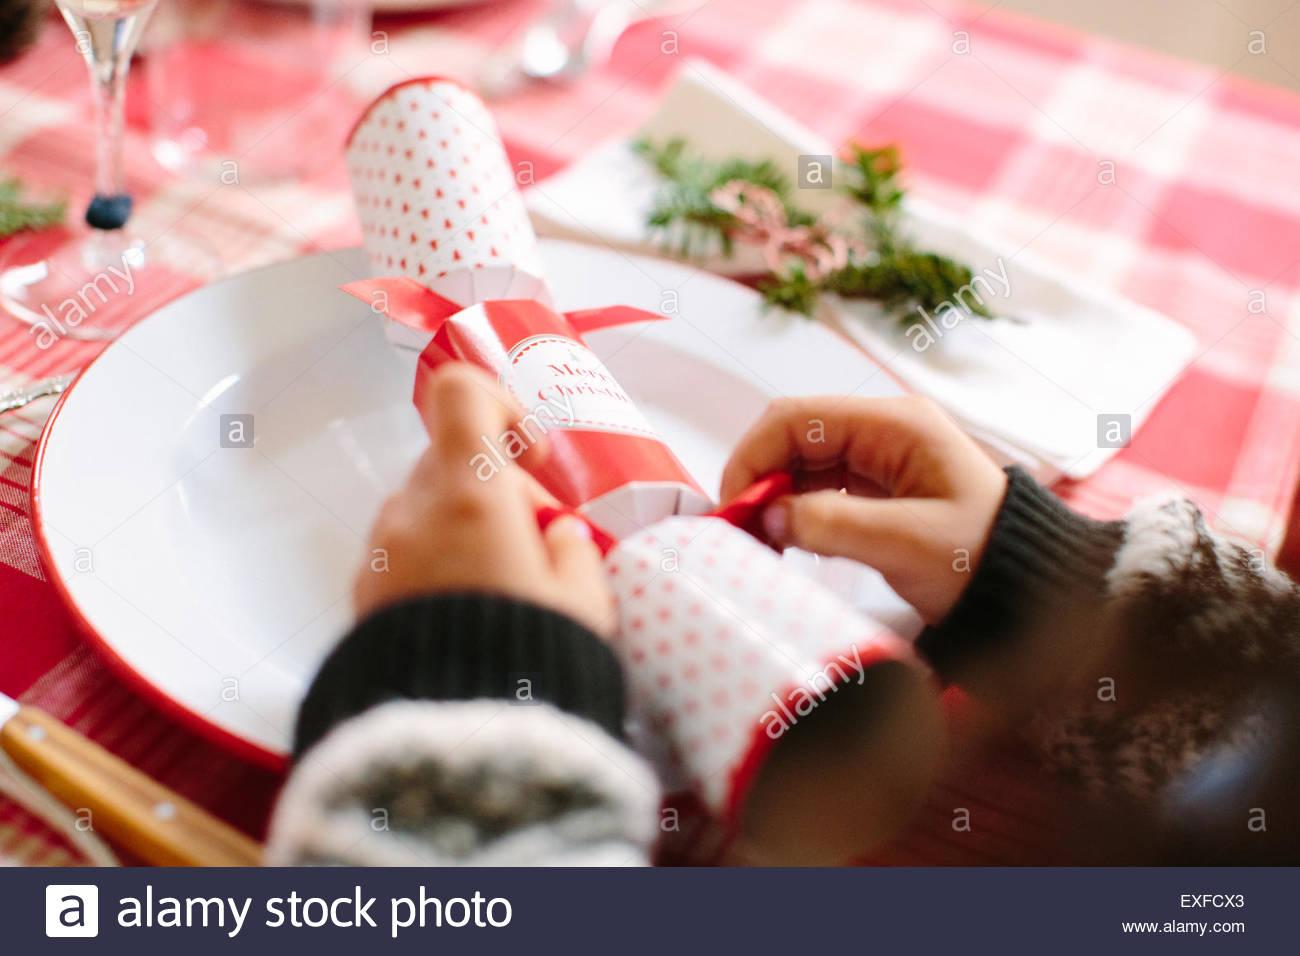 Mädchen mit Christmas Cracker auf familiäre Weihnachtsfeier Stockbild